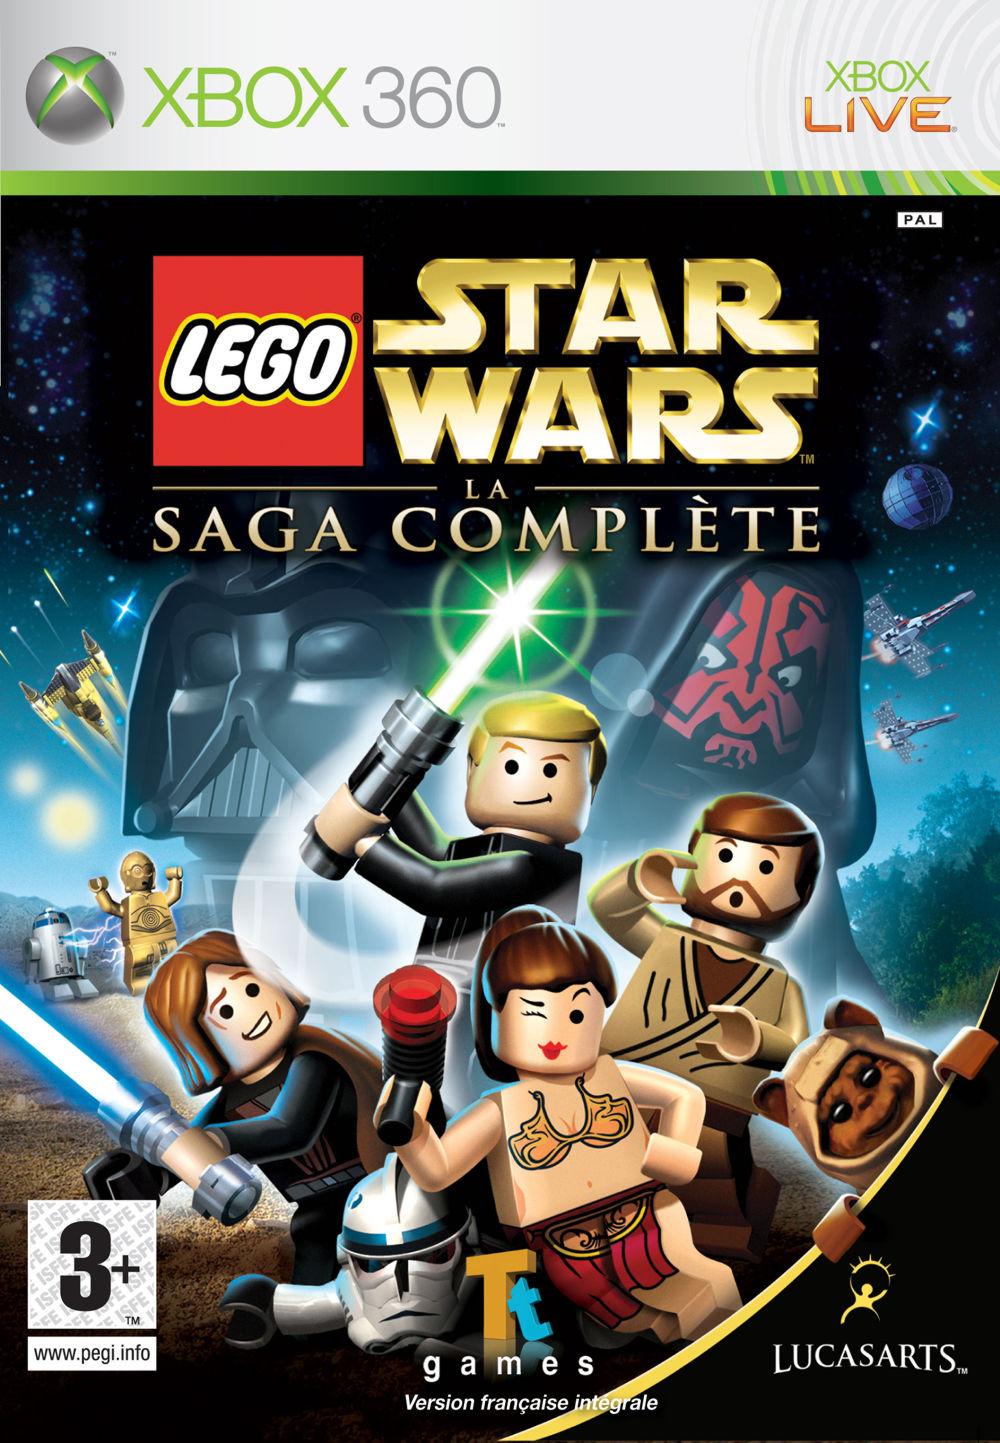 Lego Star Wars: The Skywalker Saga Lego Star Wars: The Complete Saga Free Game Download